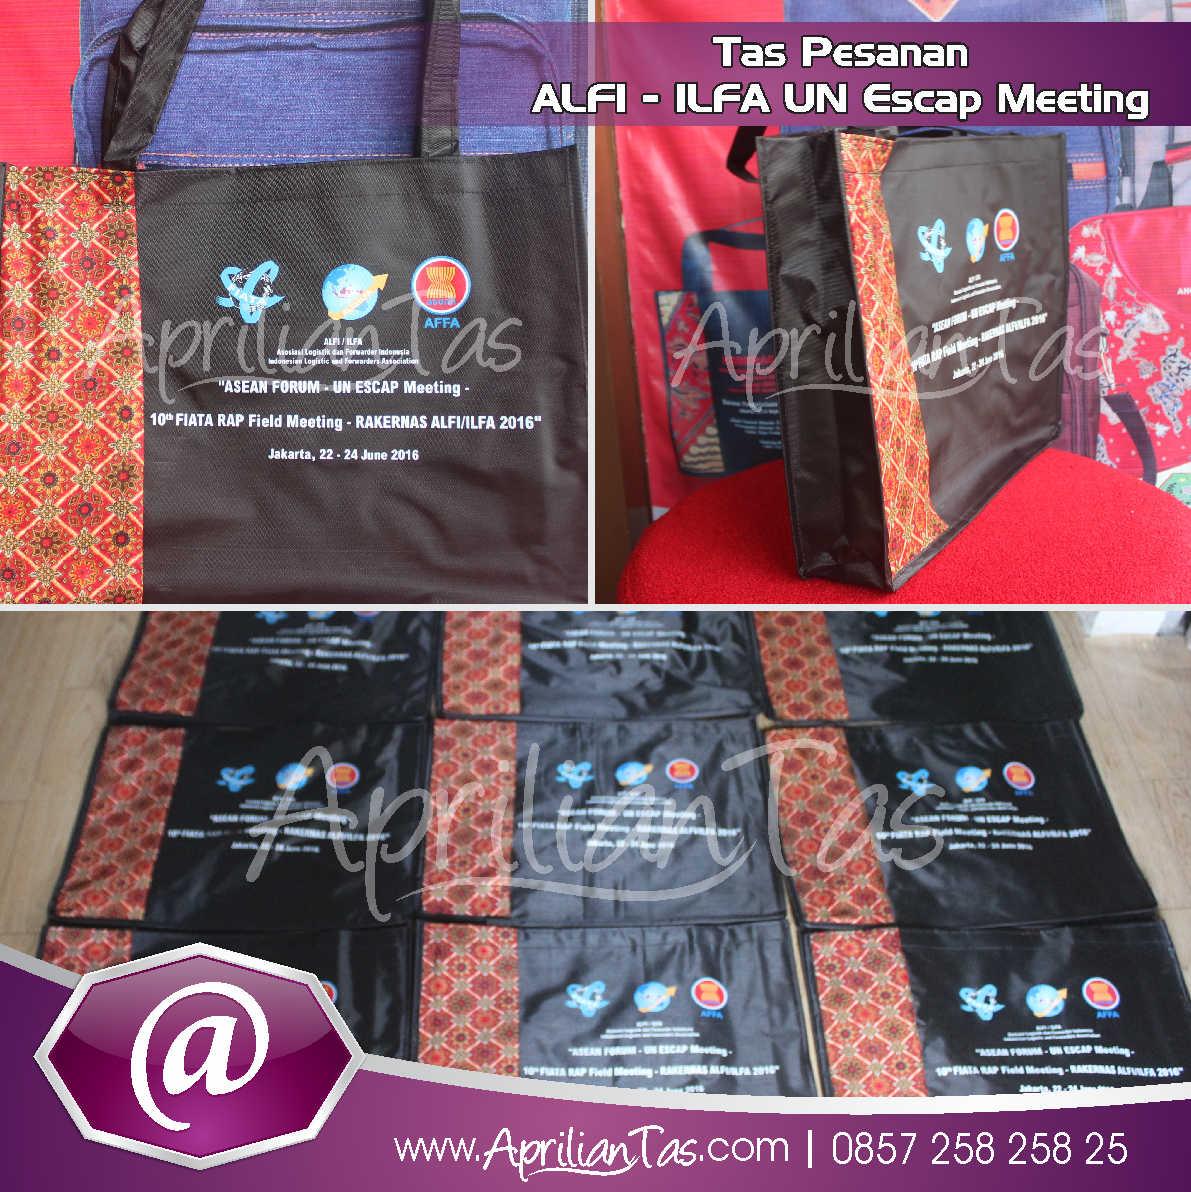 Tas Seminar Pesanan ALFI – ILFA UN Escap Meeting Jakarta